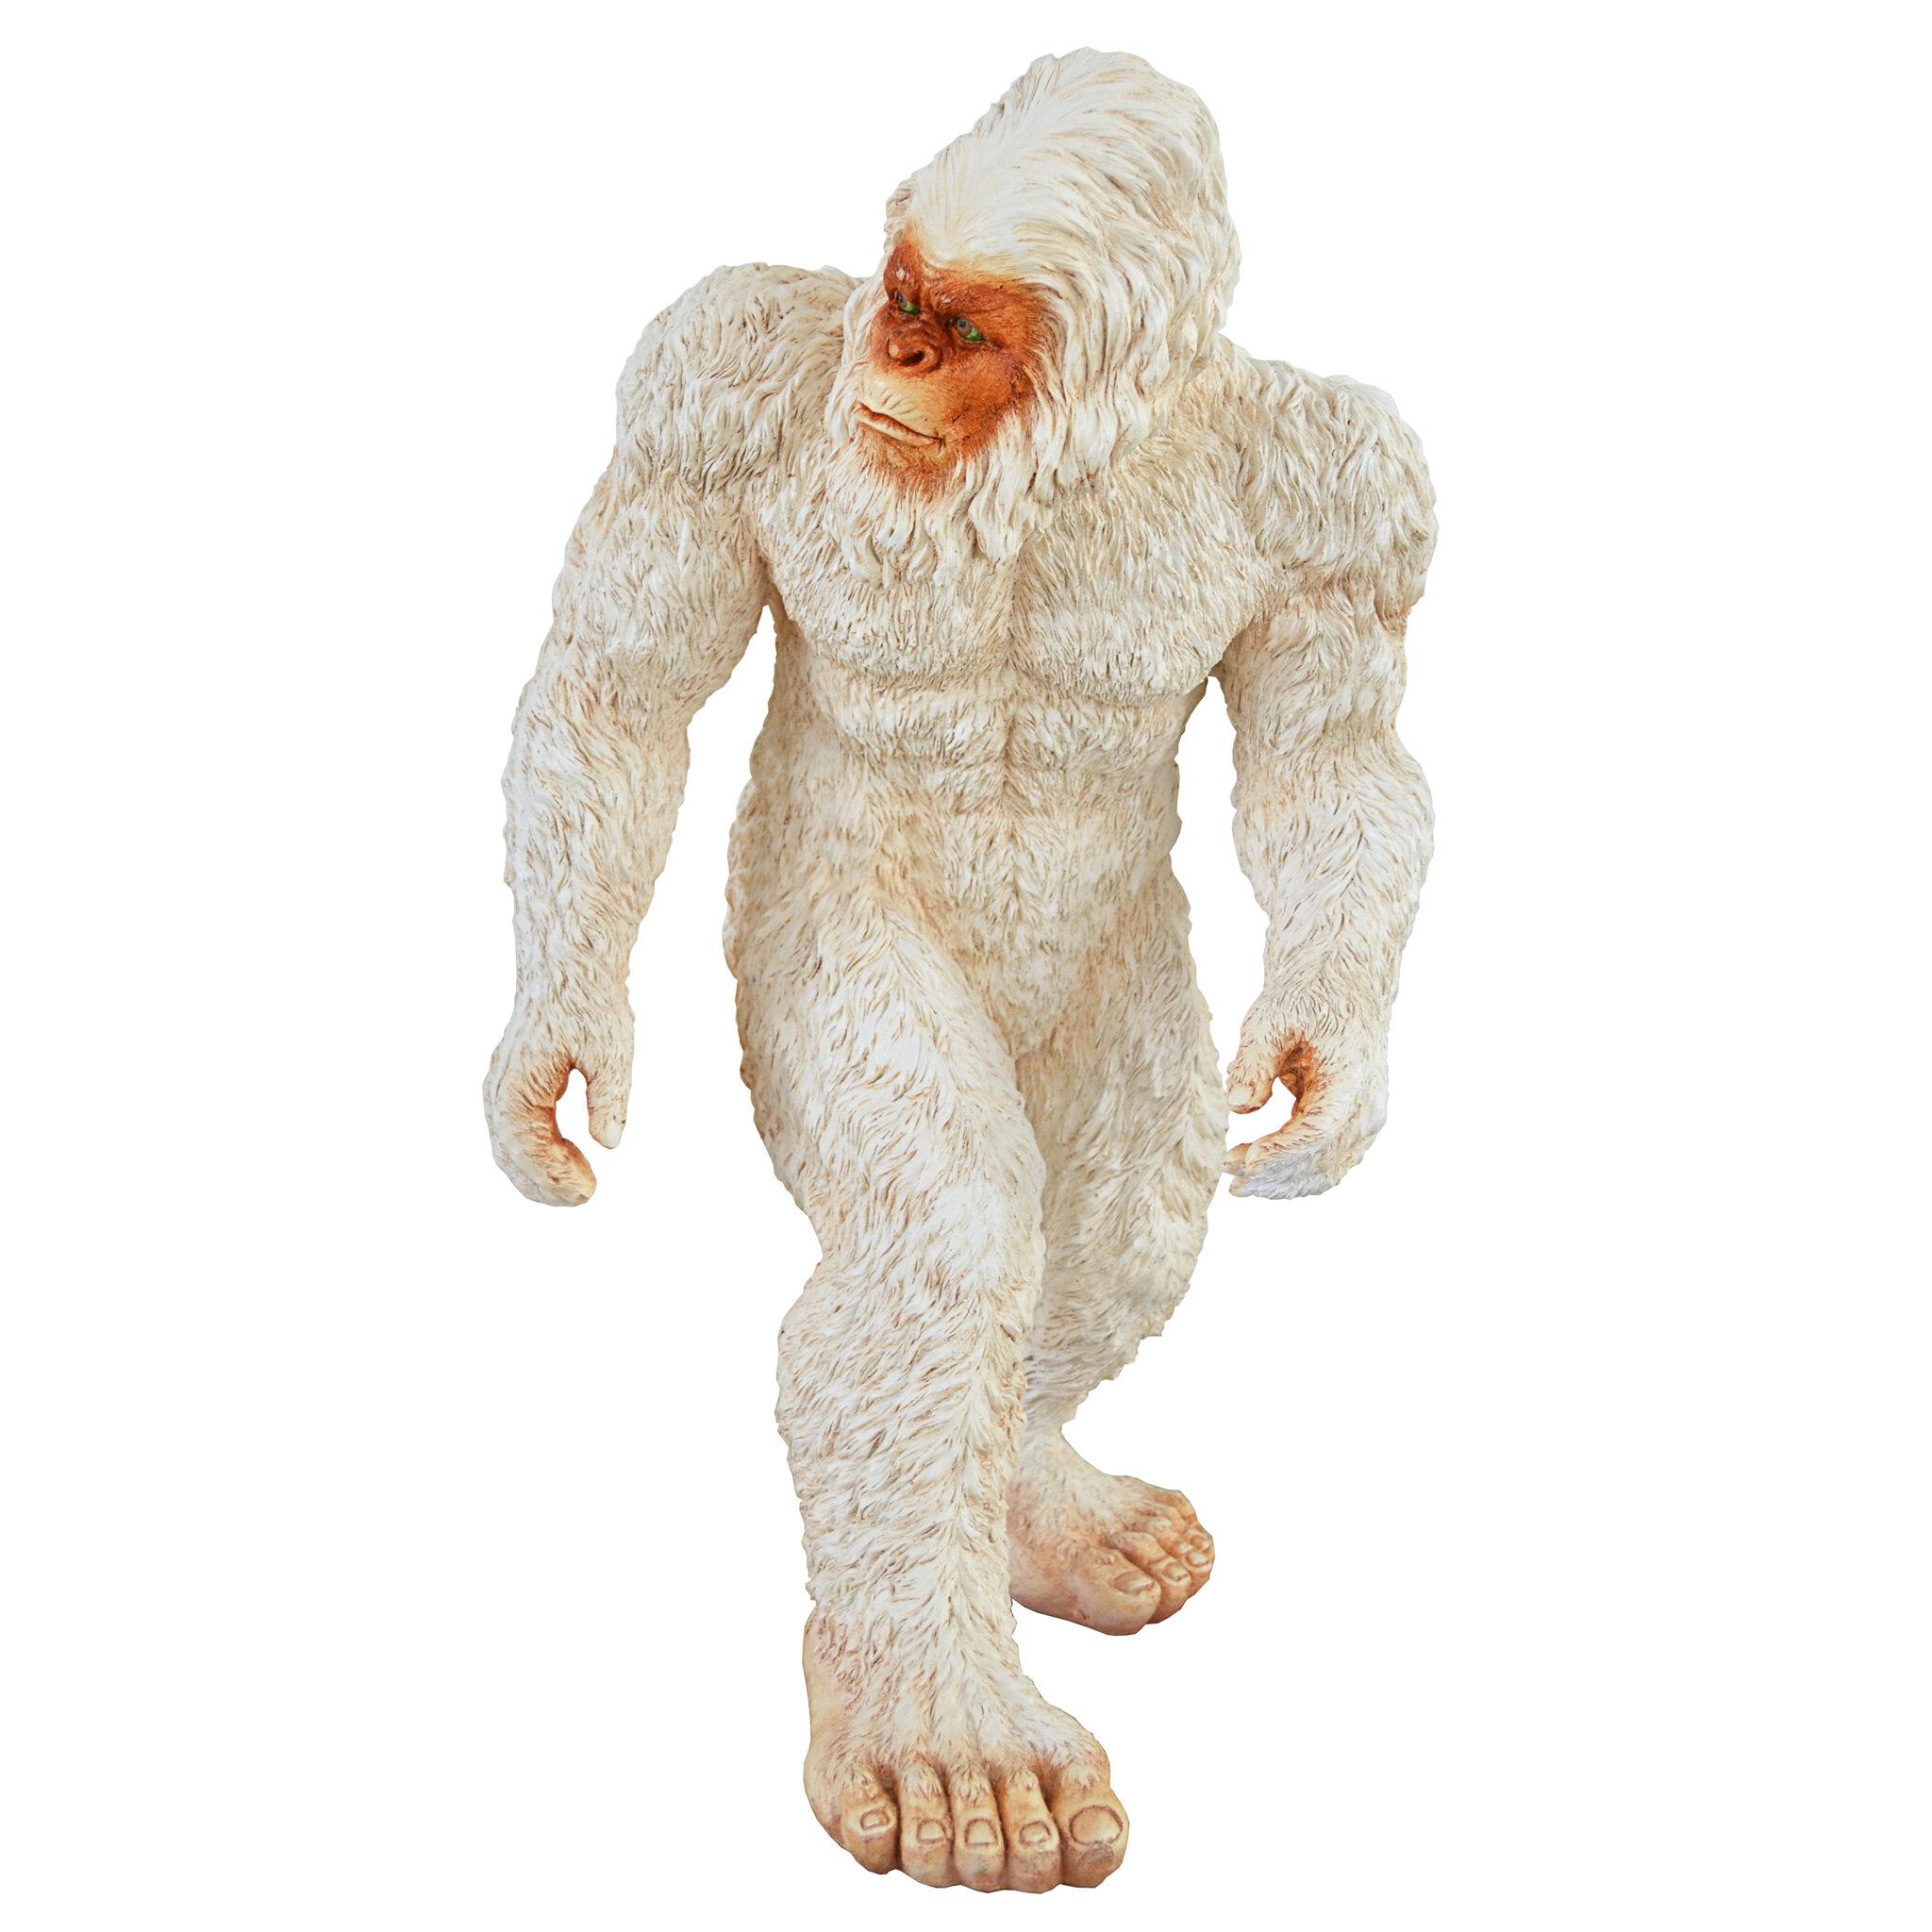 Design Toscano Bigfoot The Garden Statue U0026 Reviews | Wayfair